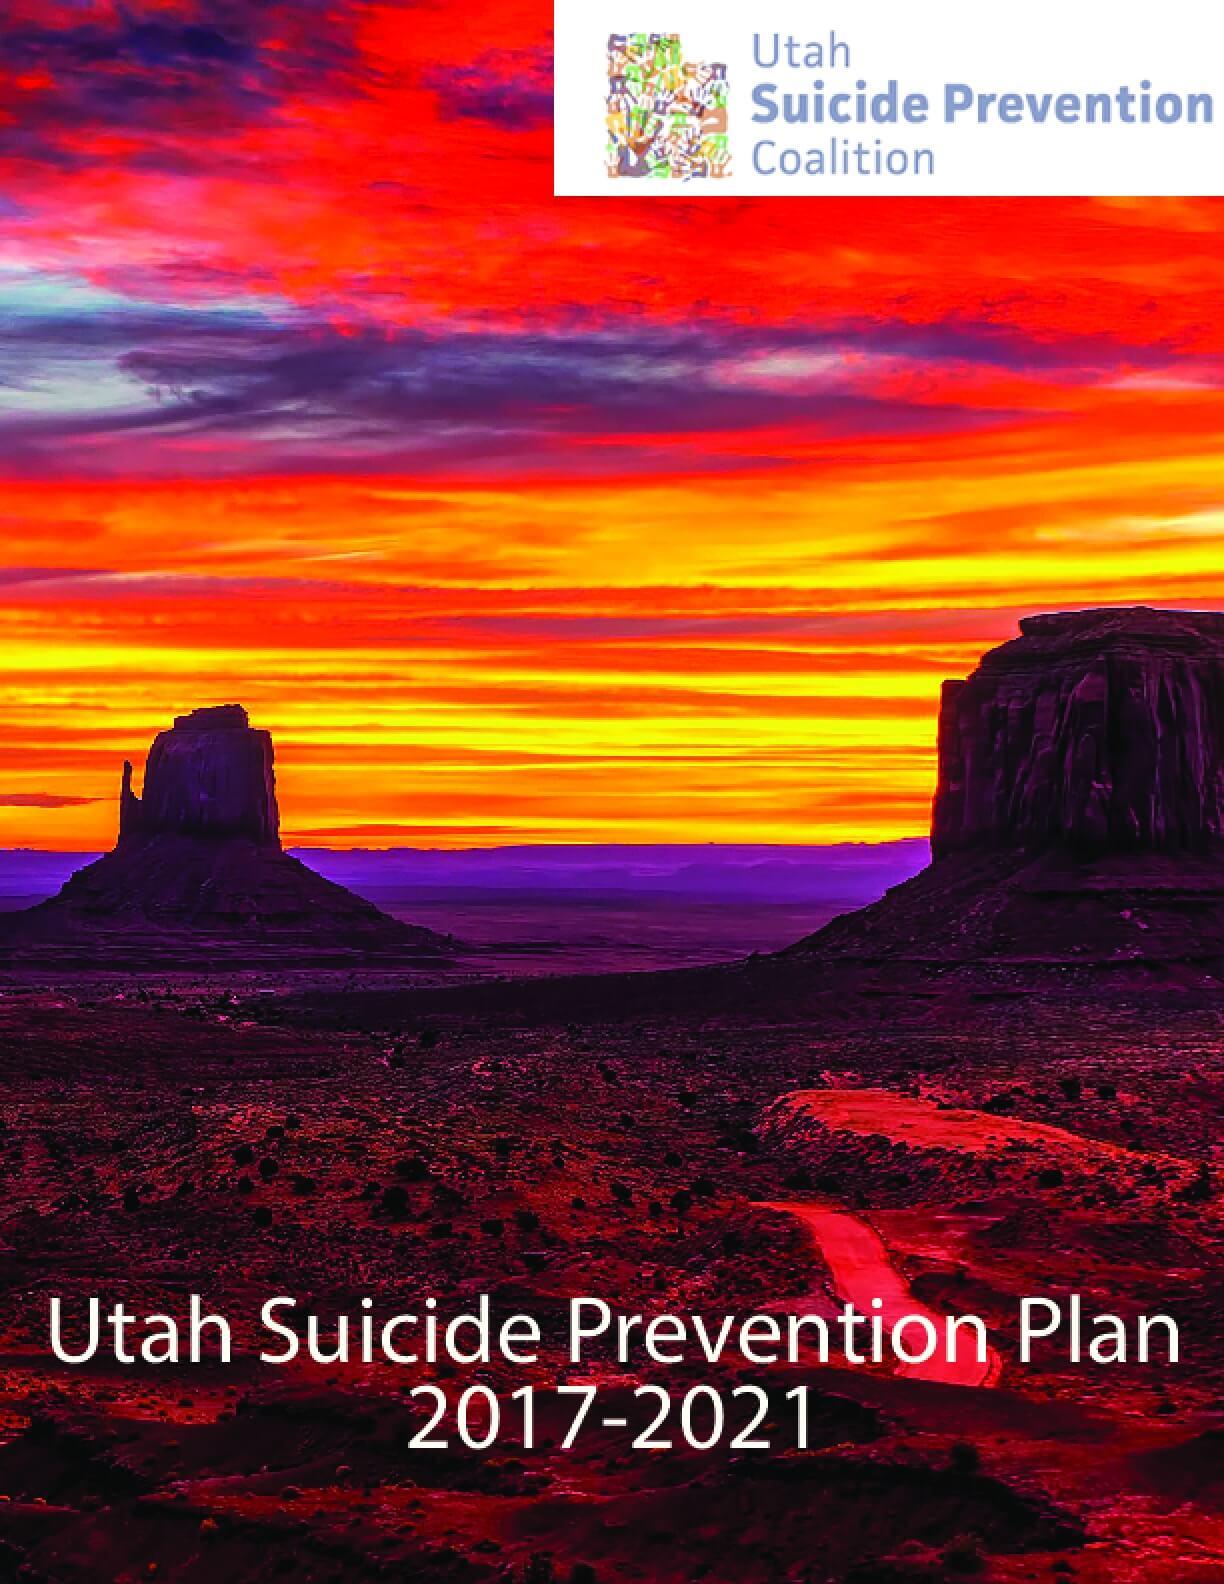 Utah Suicide Prevention Plan 2017-2021